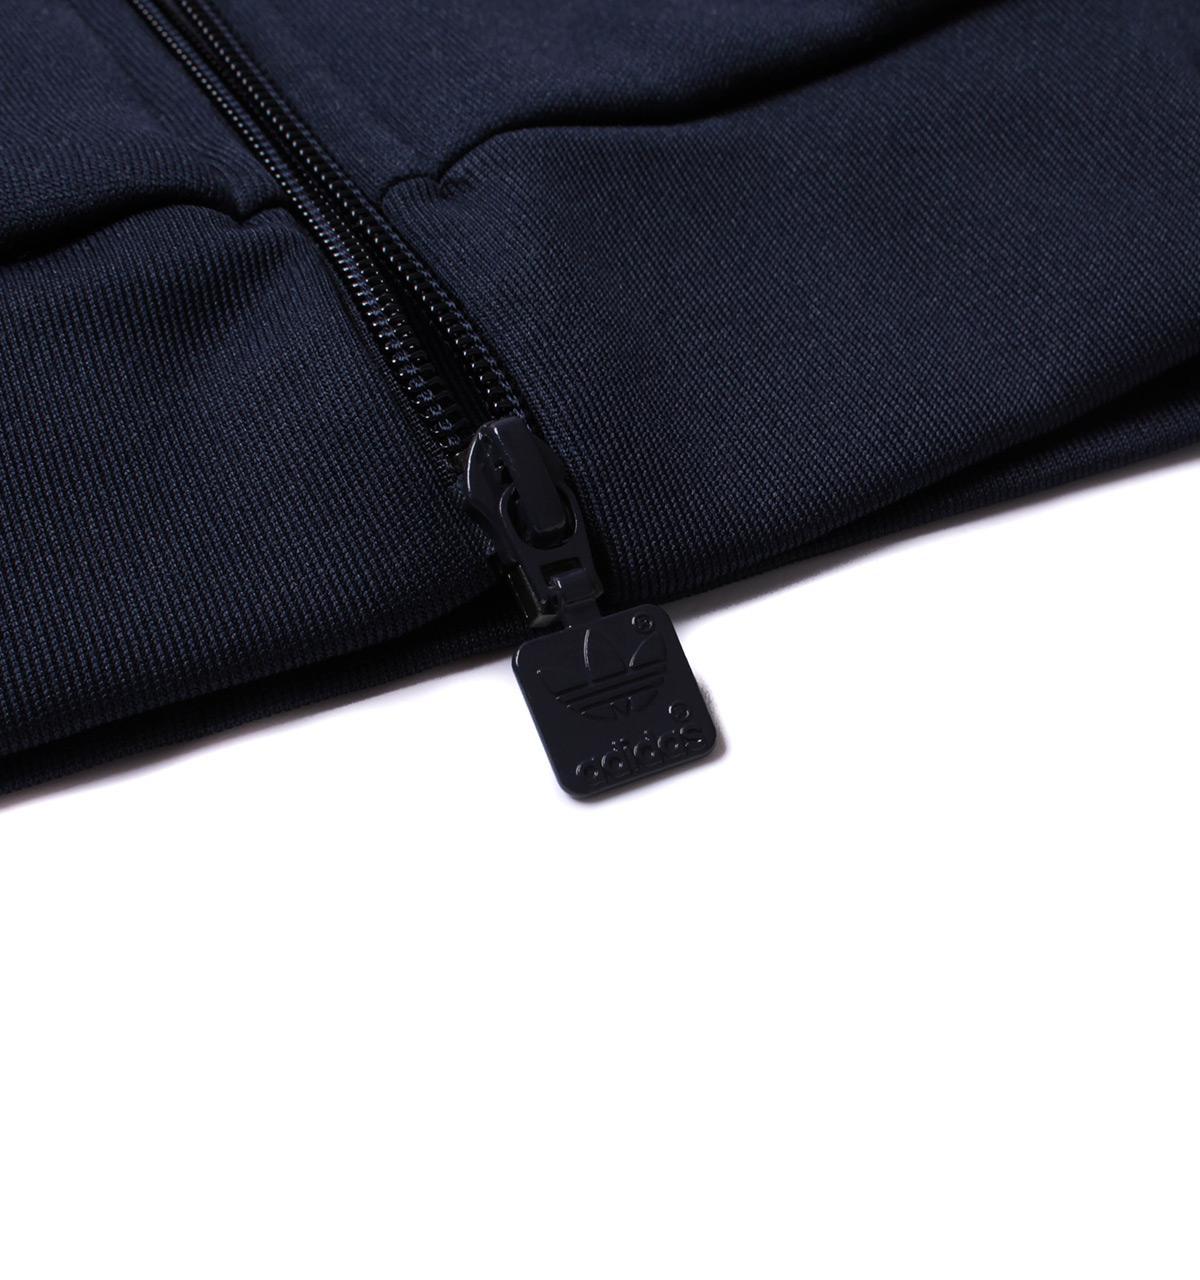 adidas Originals Synthetic Adidas Sst Tt Navy Zip Through Tracksuit Sweatshirt in Blue for Men